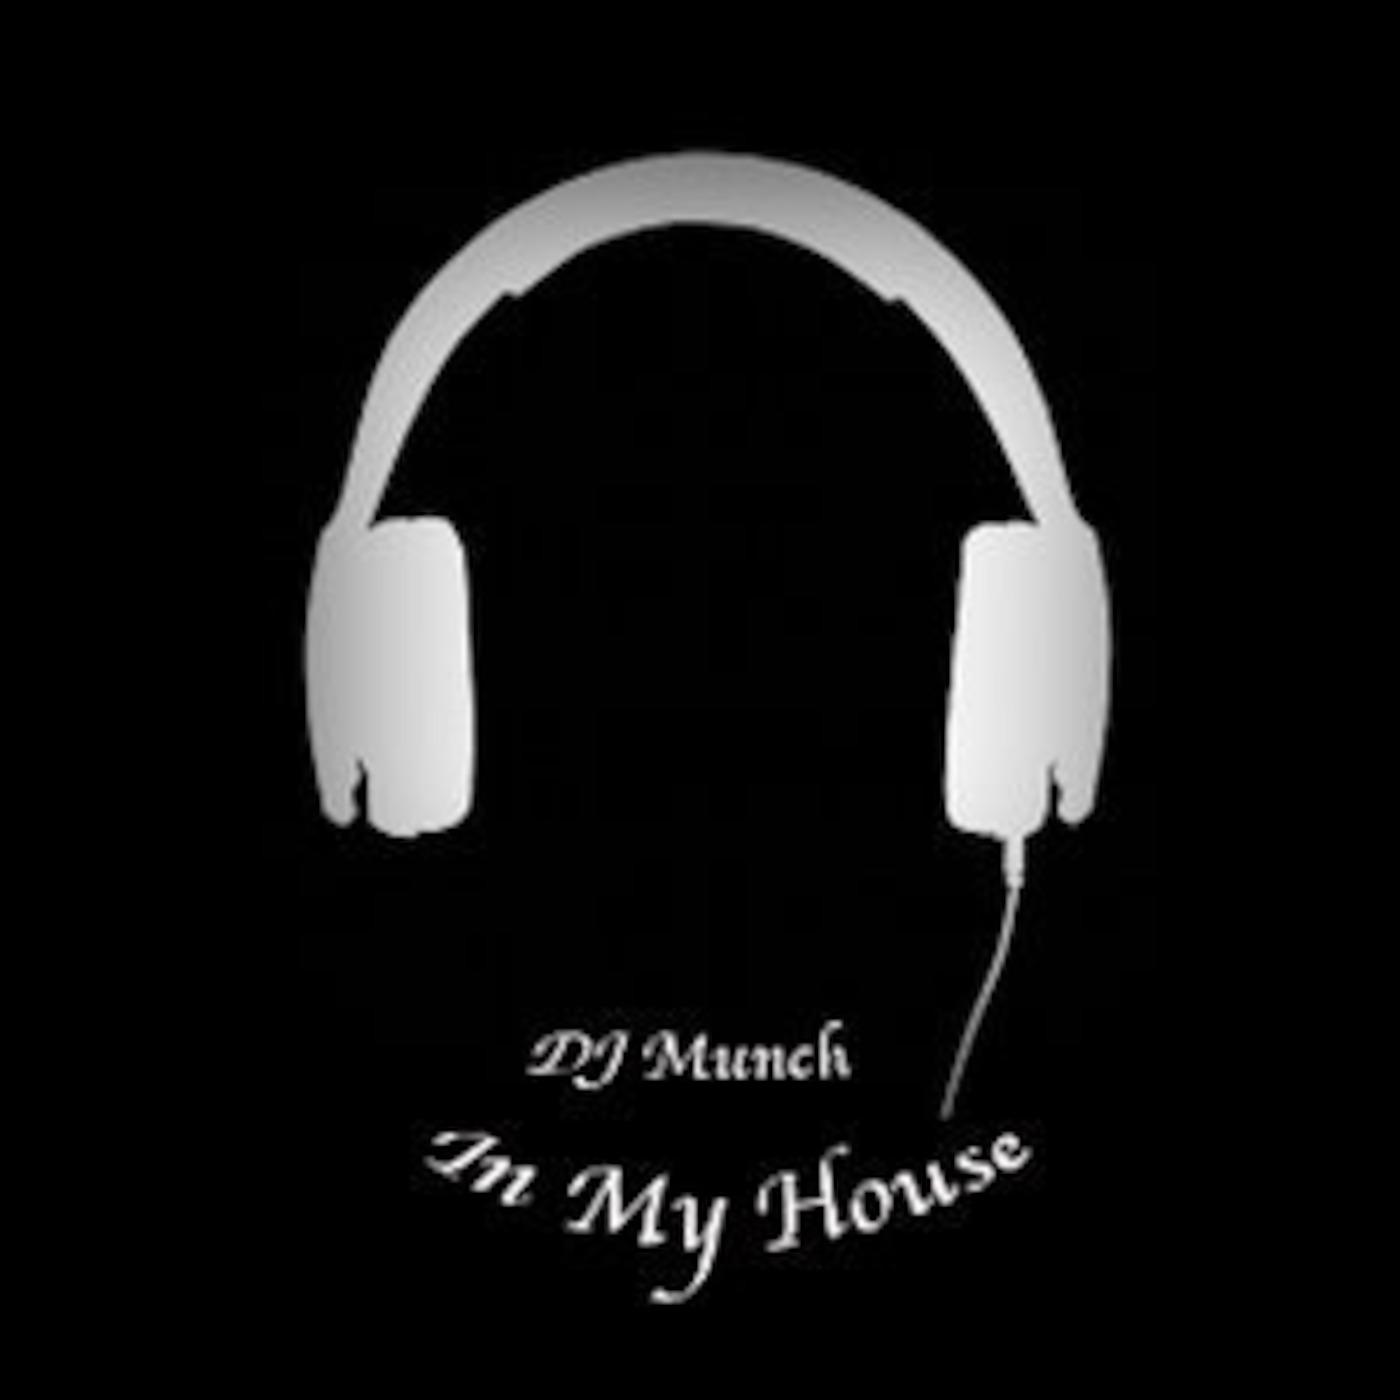 DJ Munch - In My House